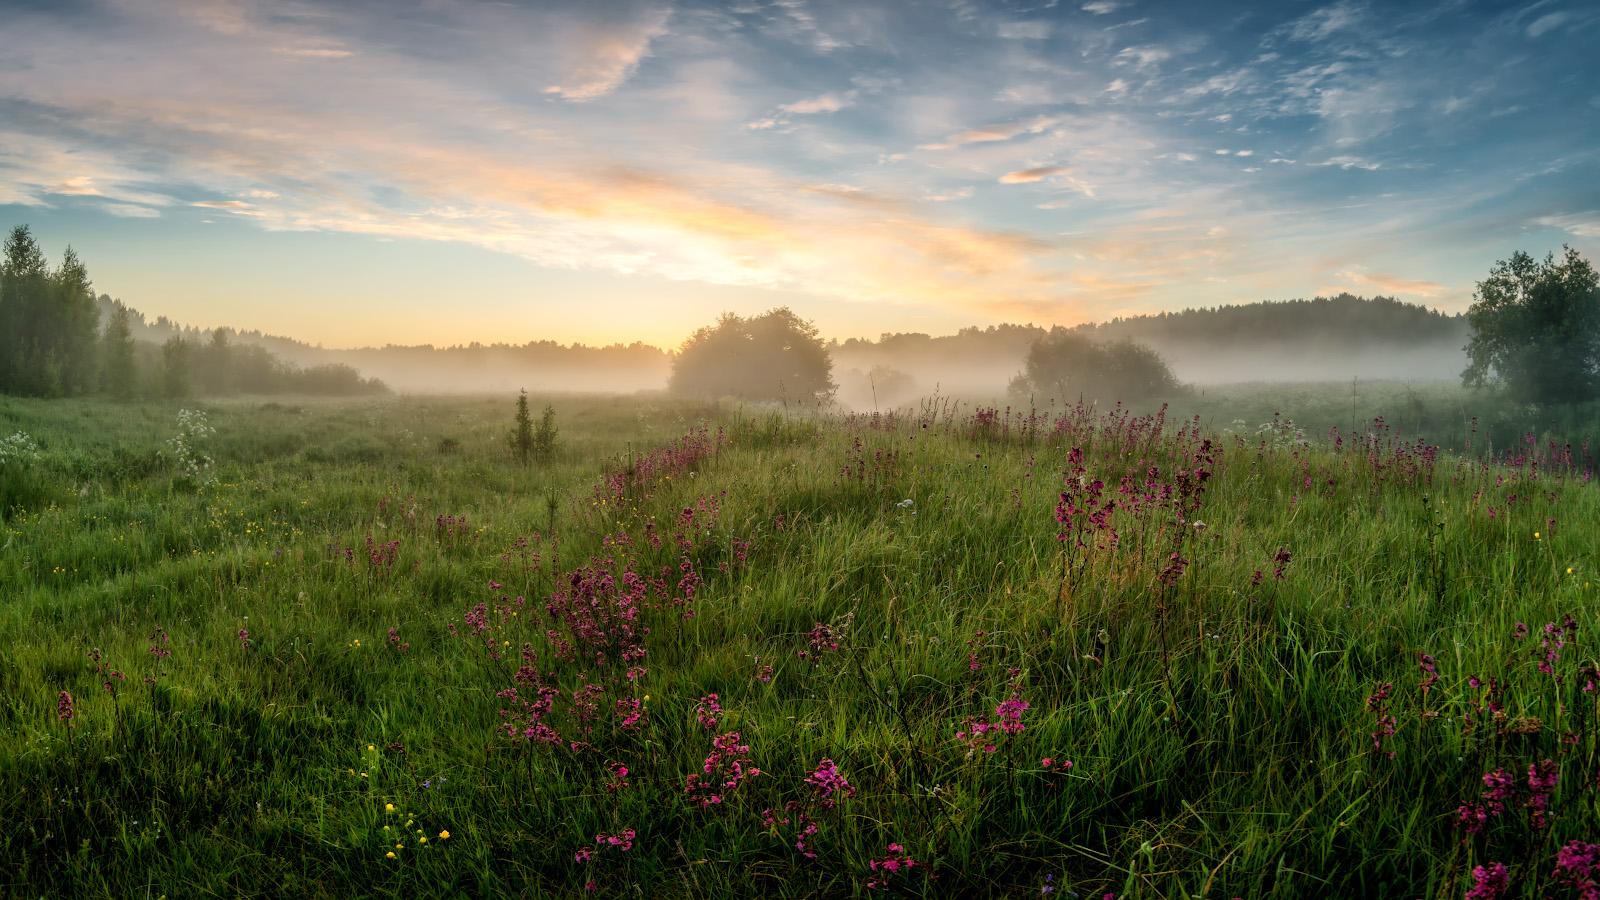 лето, июнь, утродо восхода